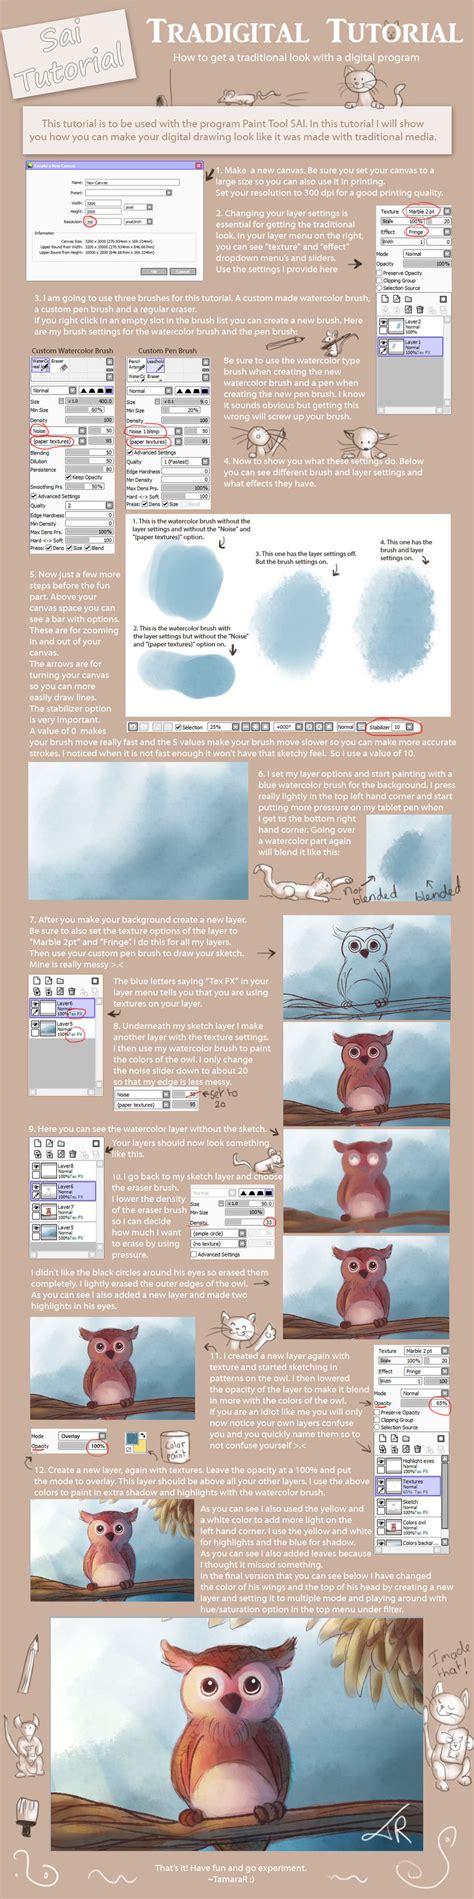 tutorial online html paint tool sai free download blog tools download